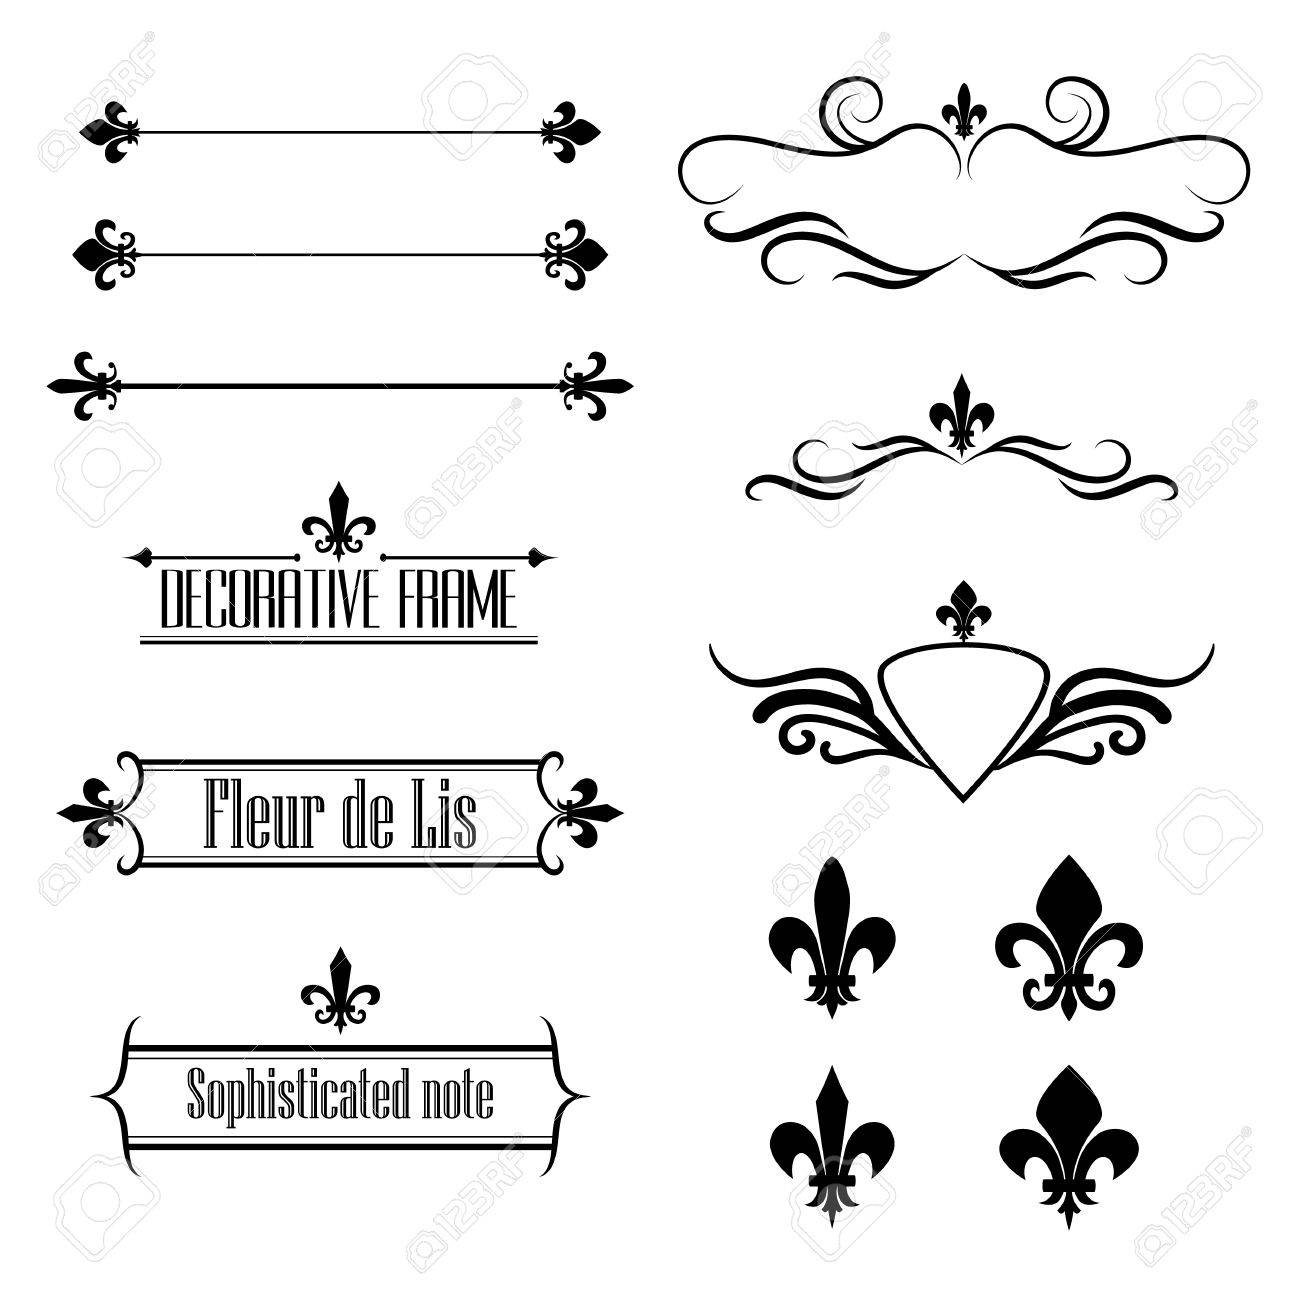 Set Of Calligraphic Flourish Design Elements Borders And Frames